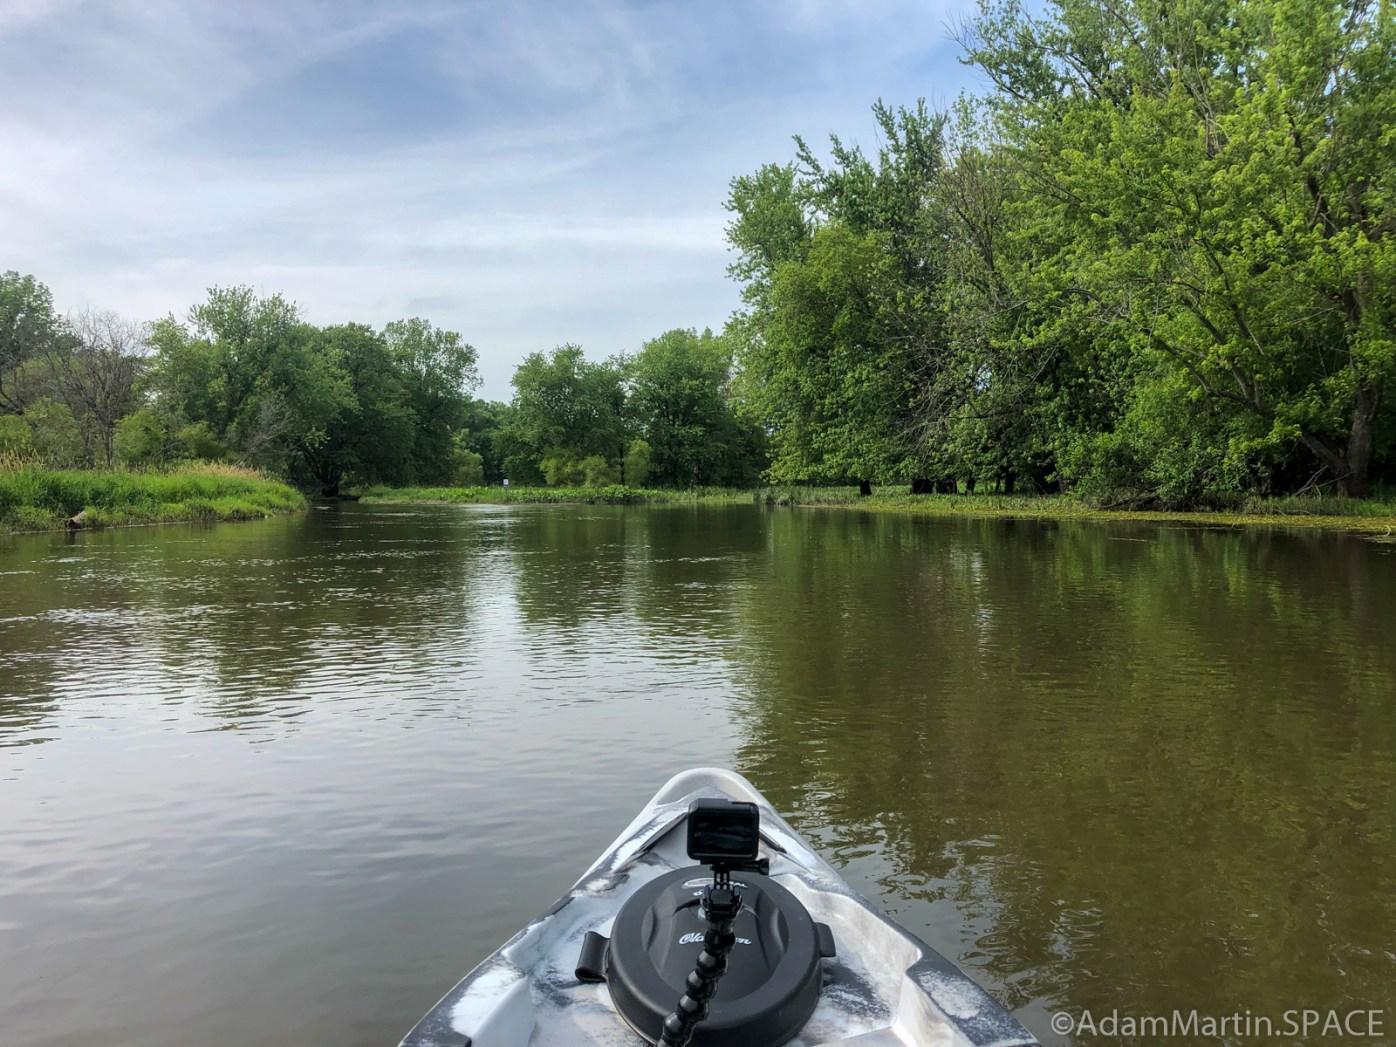 Perrot State Park - Paddling the Voyageurs Canoe Trail